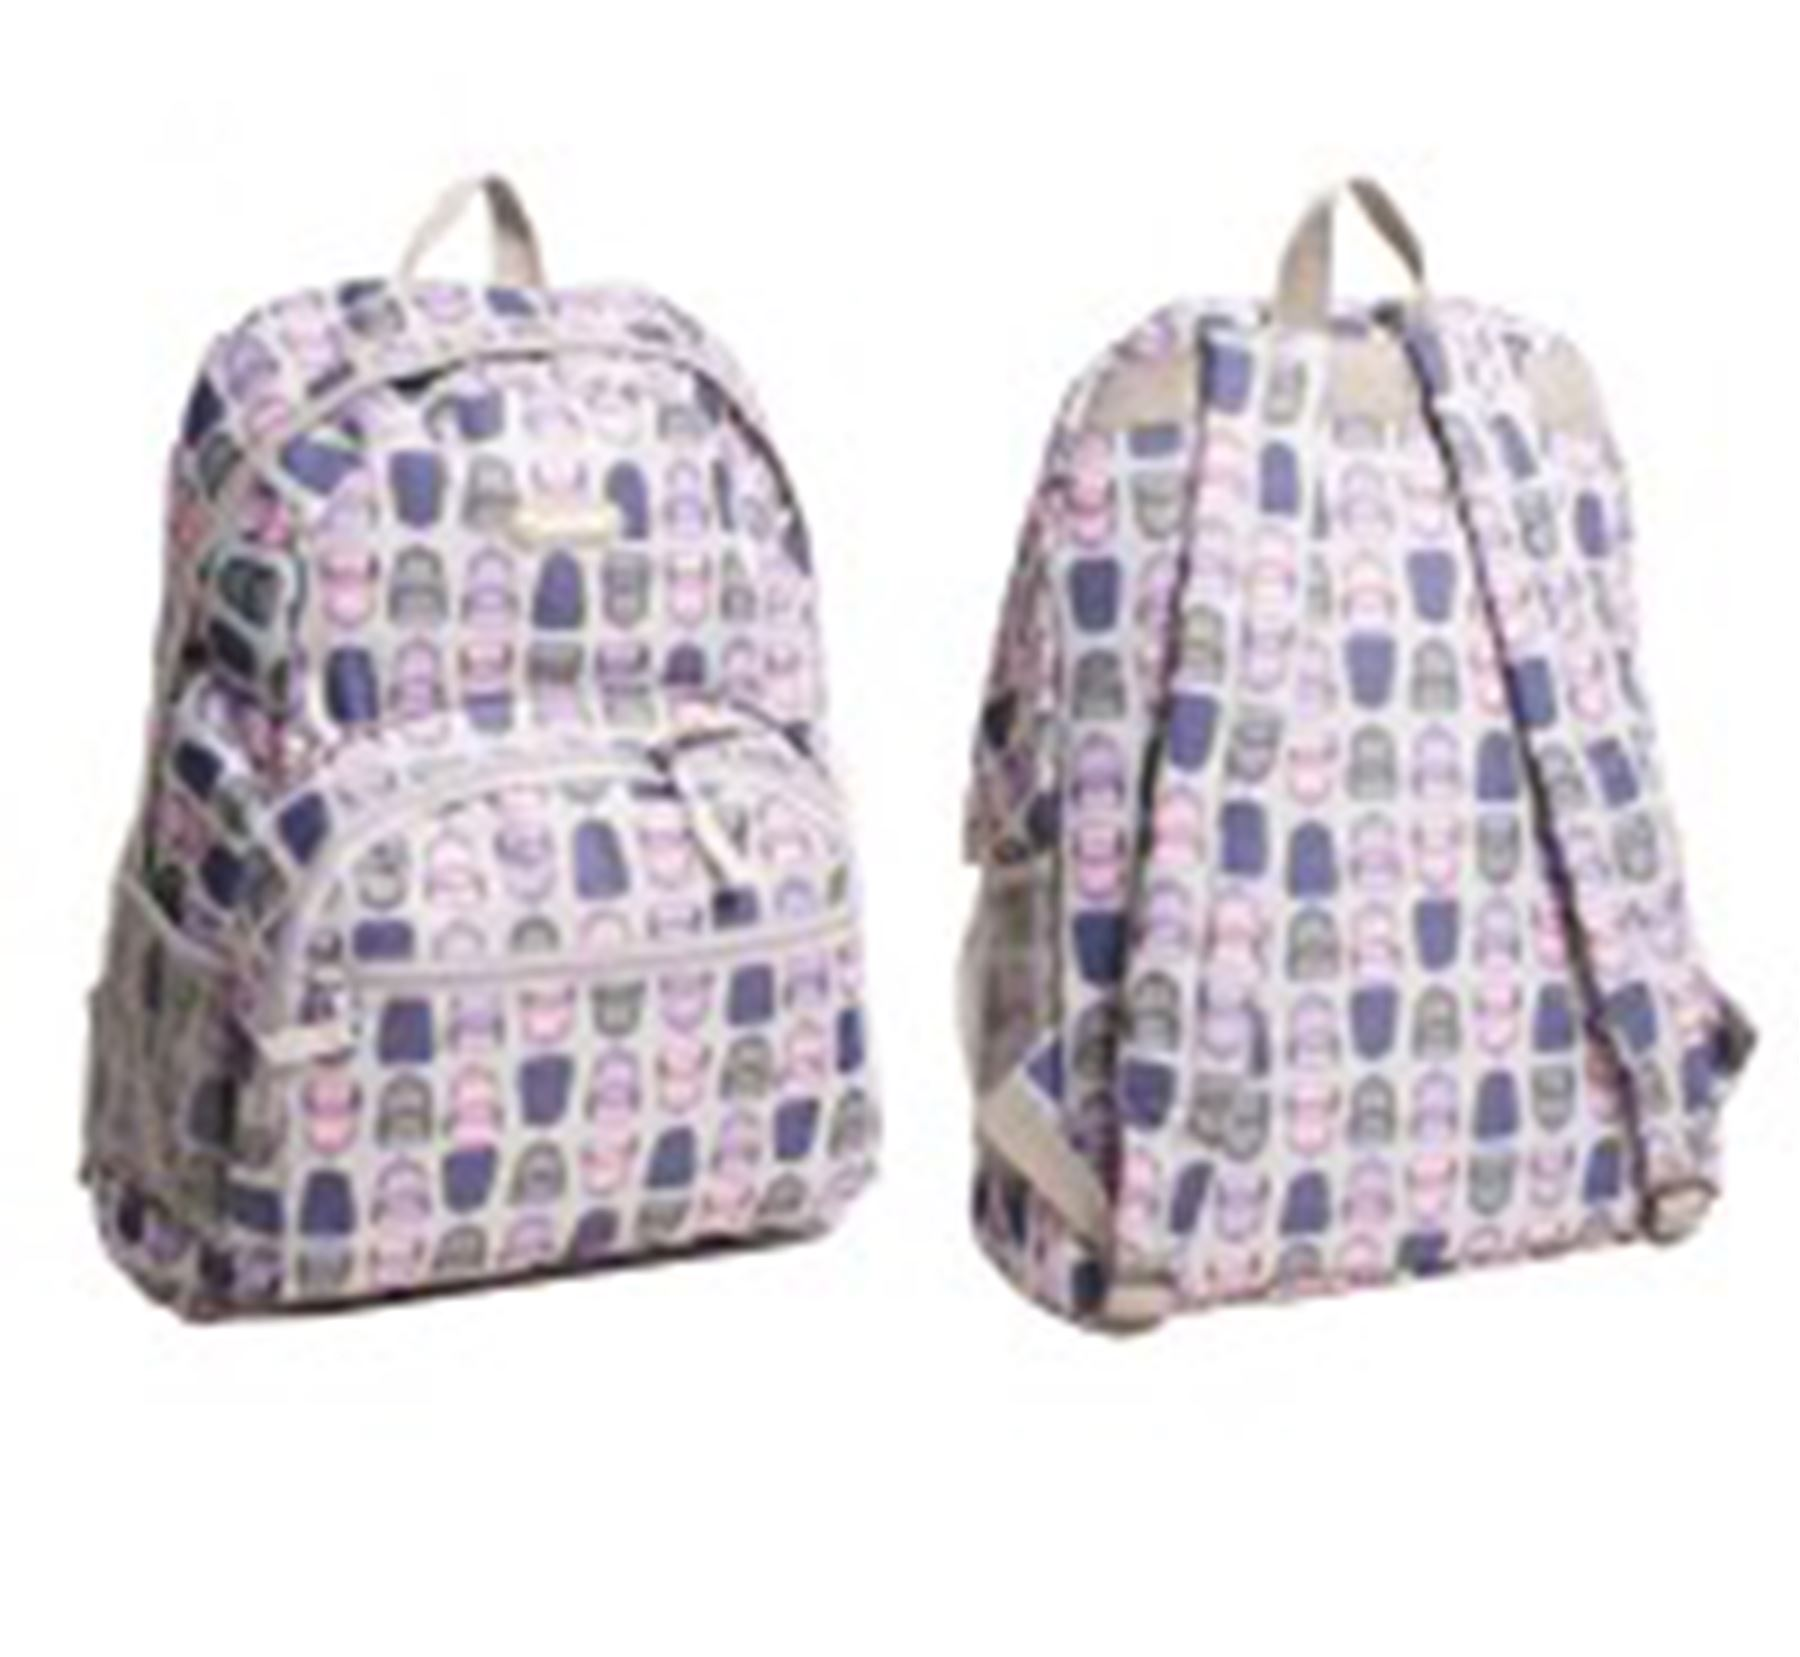 Hi-Tec-Mens-Ladies-Printed-Backpack-Rucksack-School-College-Gym-Hand-Travel-Bag thumbnail 5